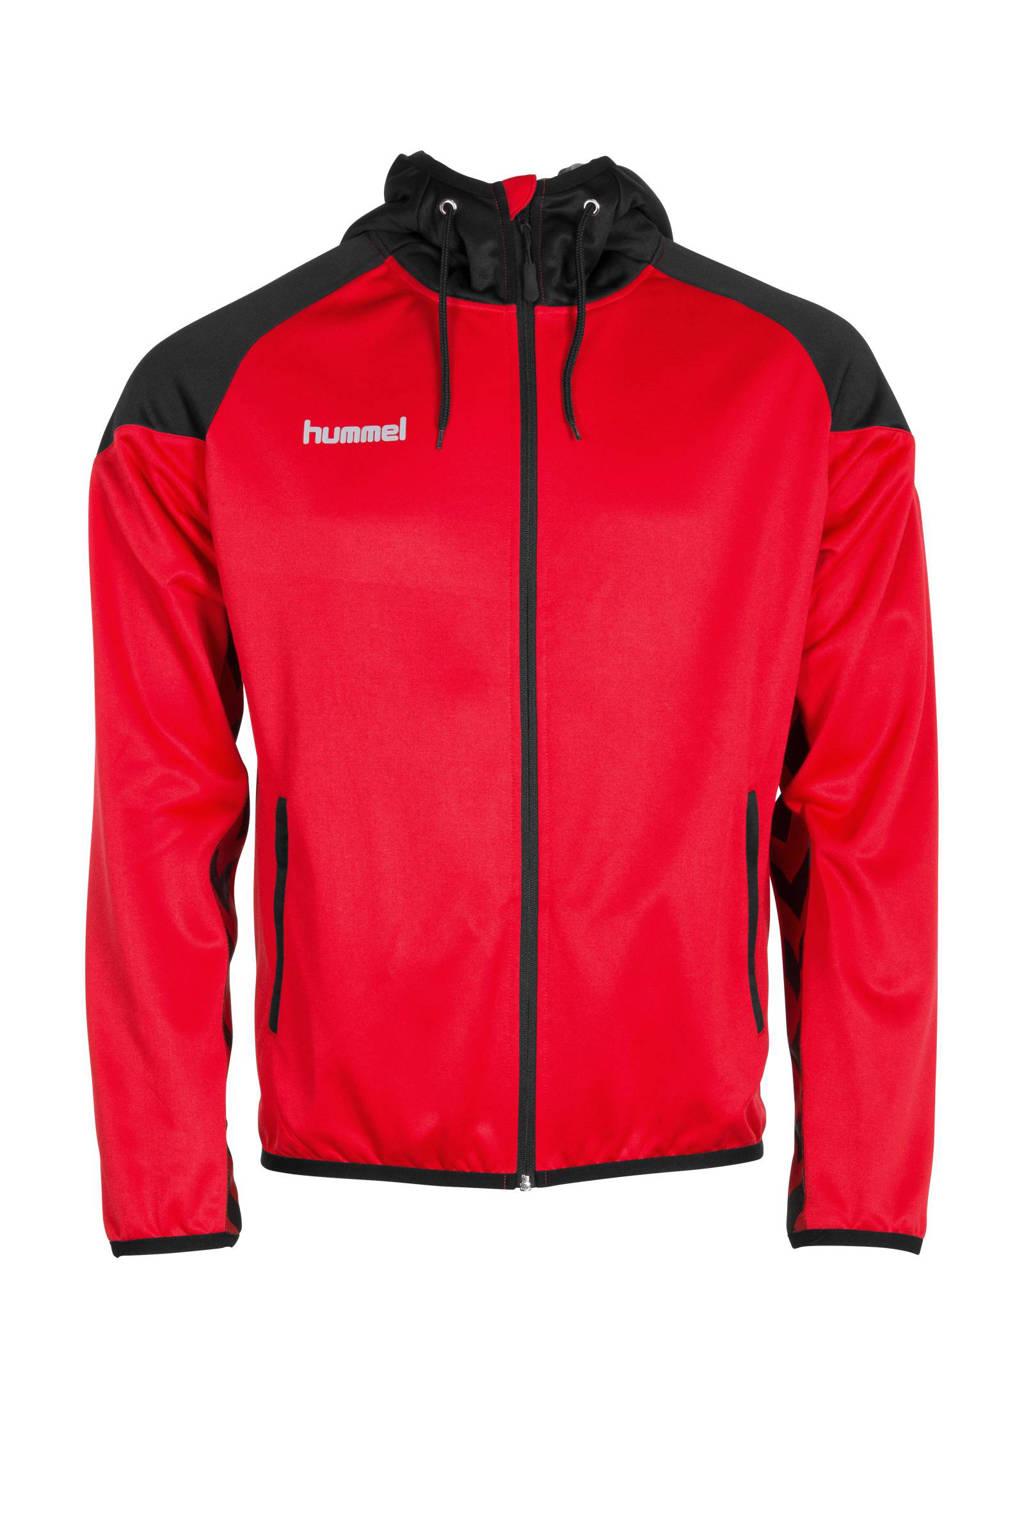 hummel Junior  sportvest, Rood/zwart